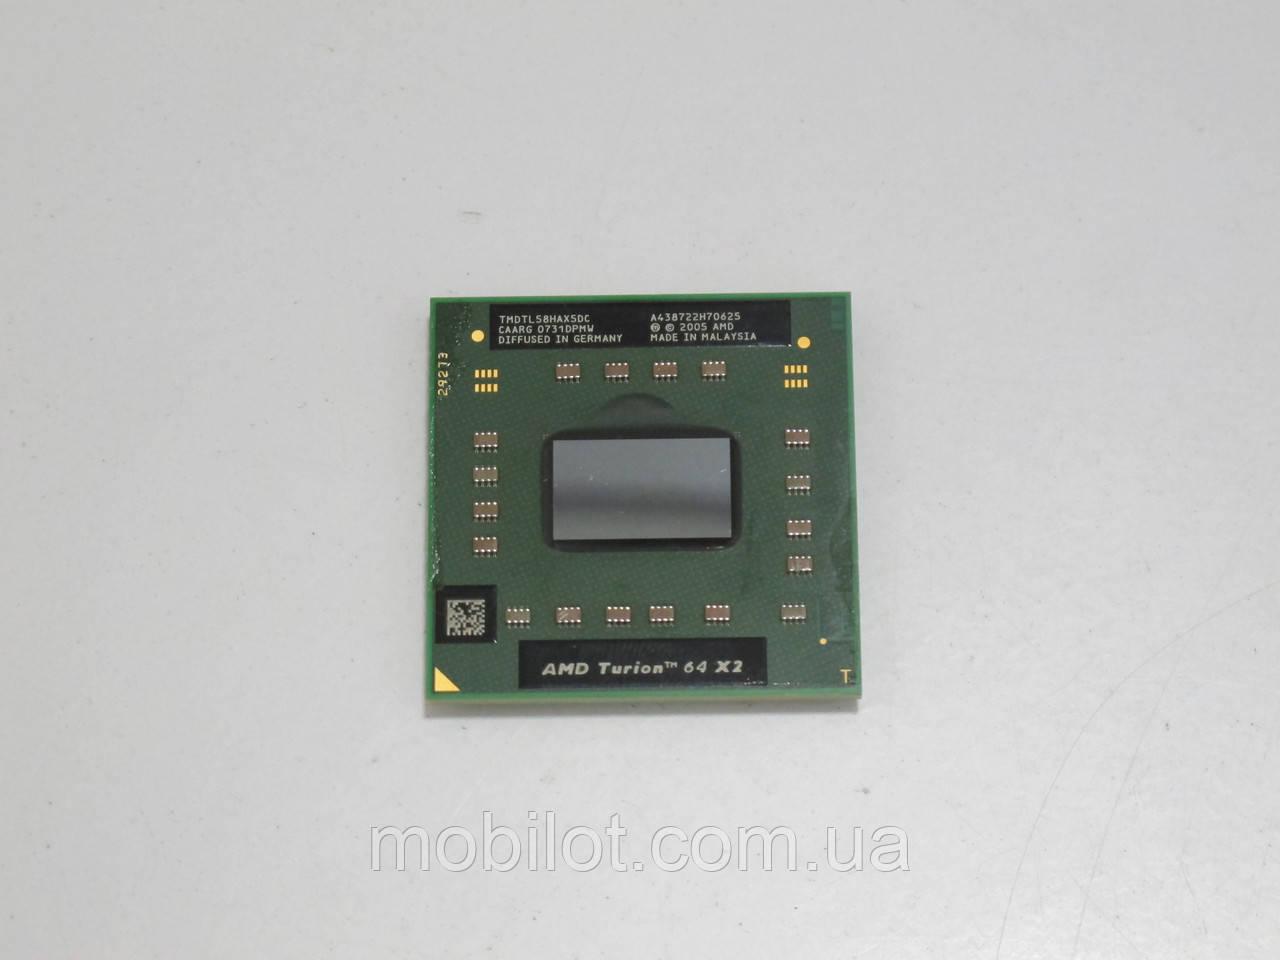 Процессор AMD Turion 64 X2 (NZ-3899)